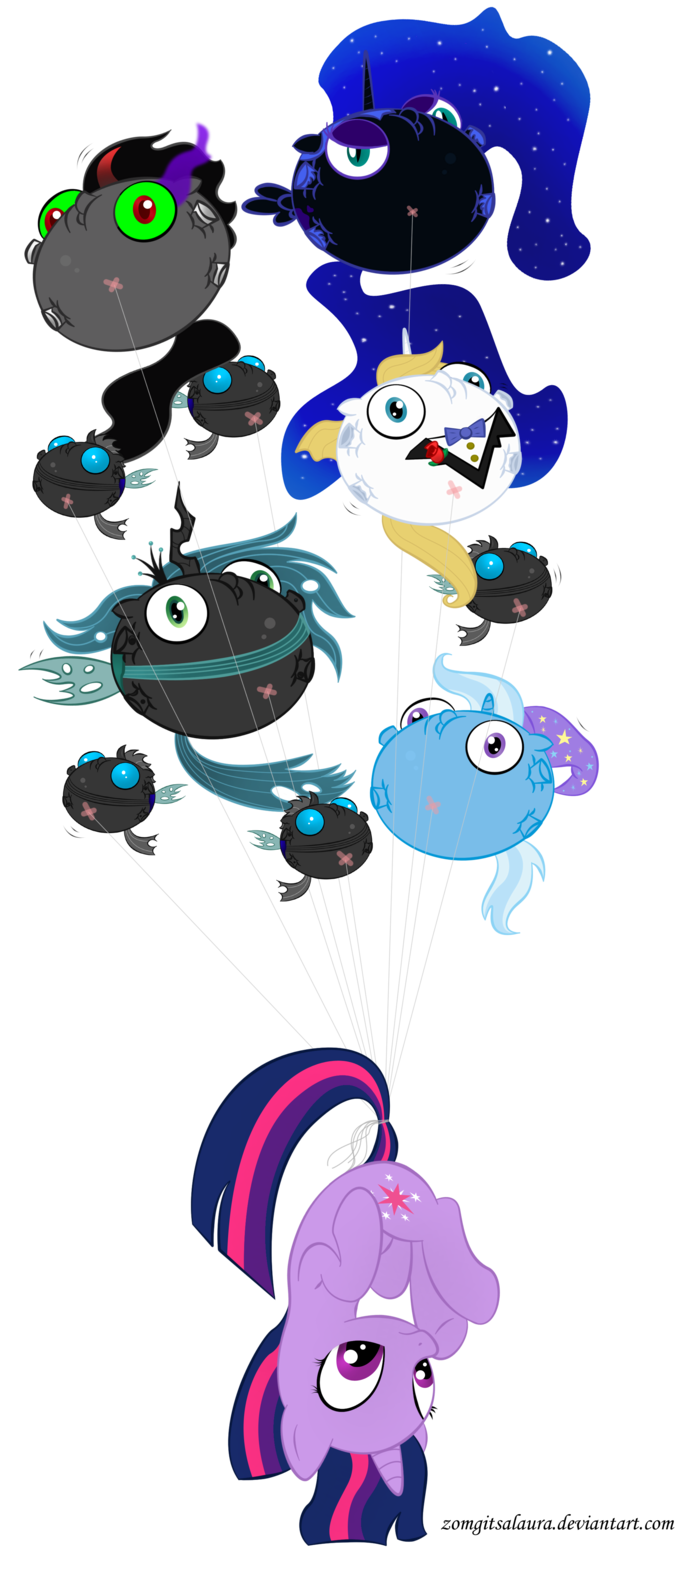 Evil Balloon Attack